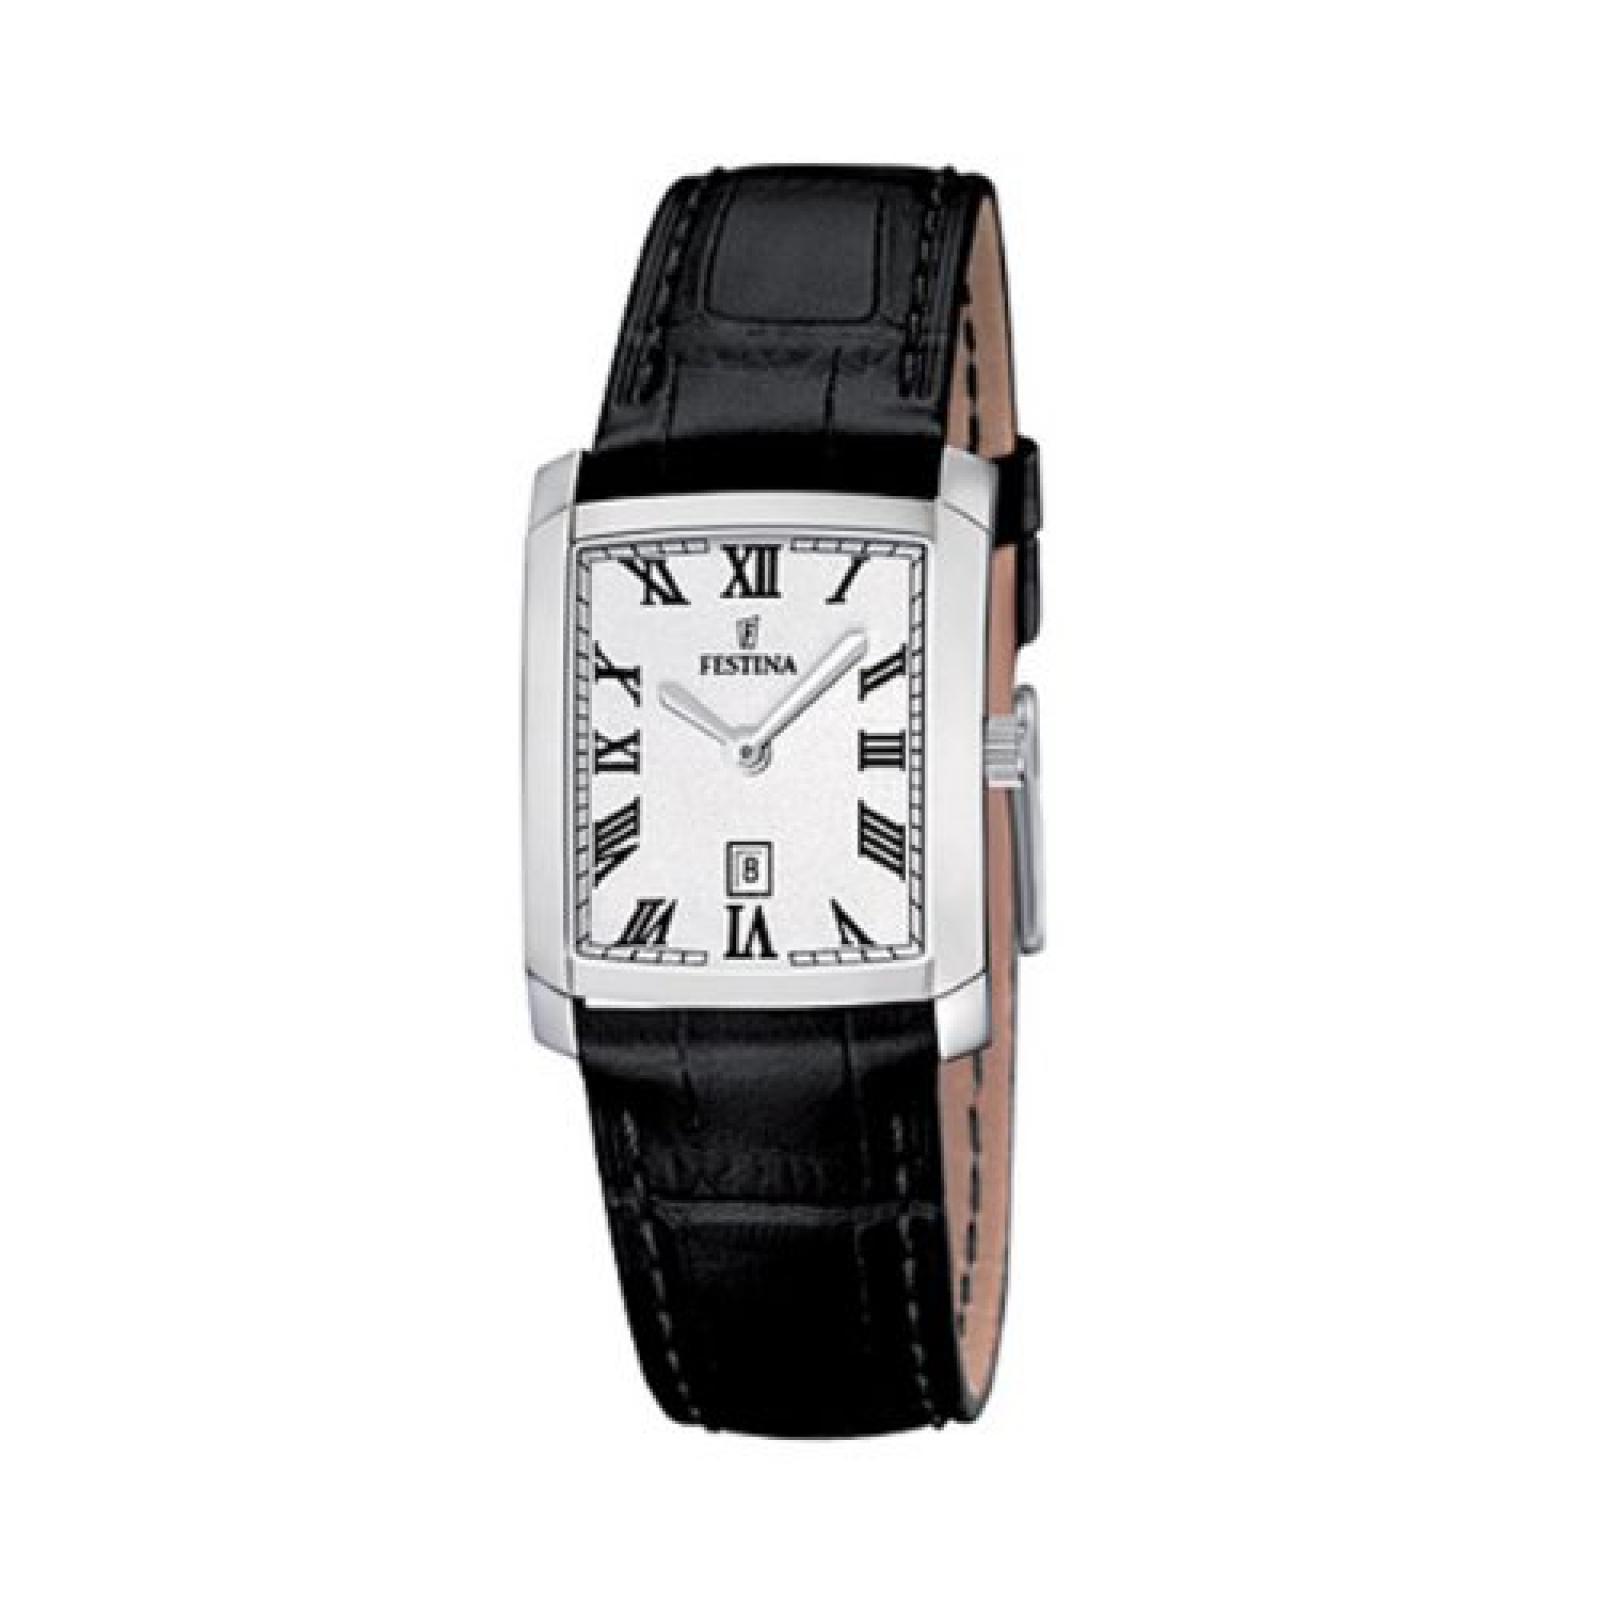 Festina Damen Armbanduhr F16513/4